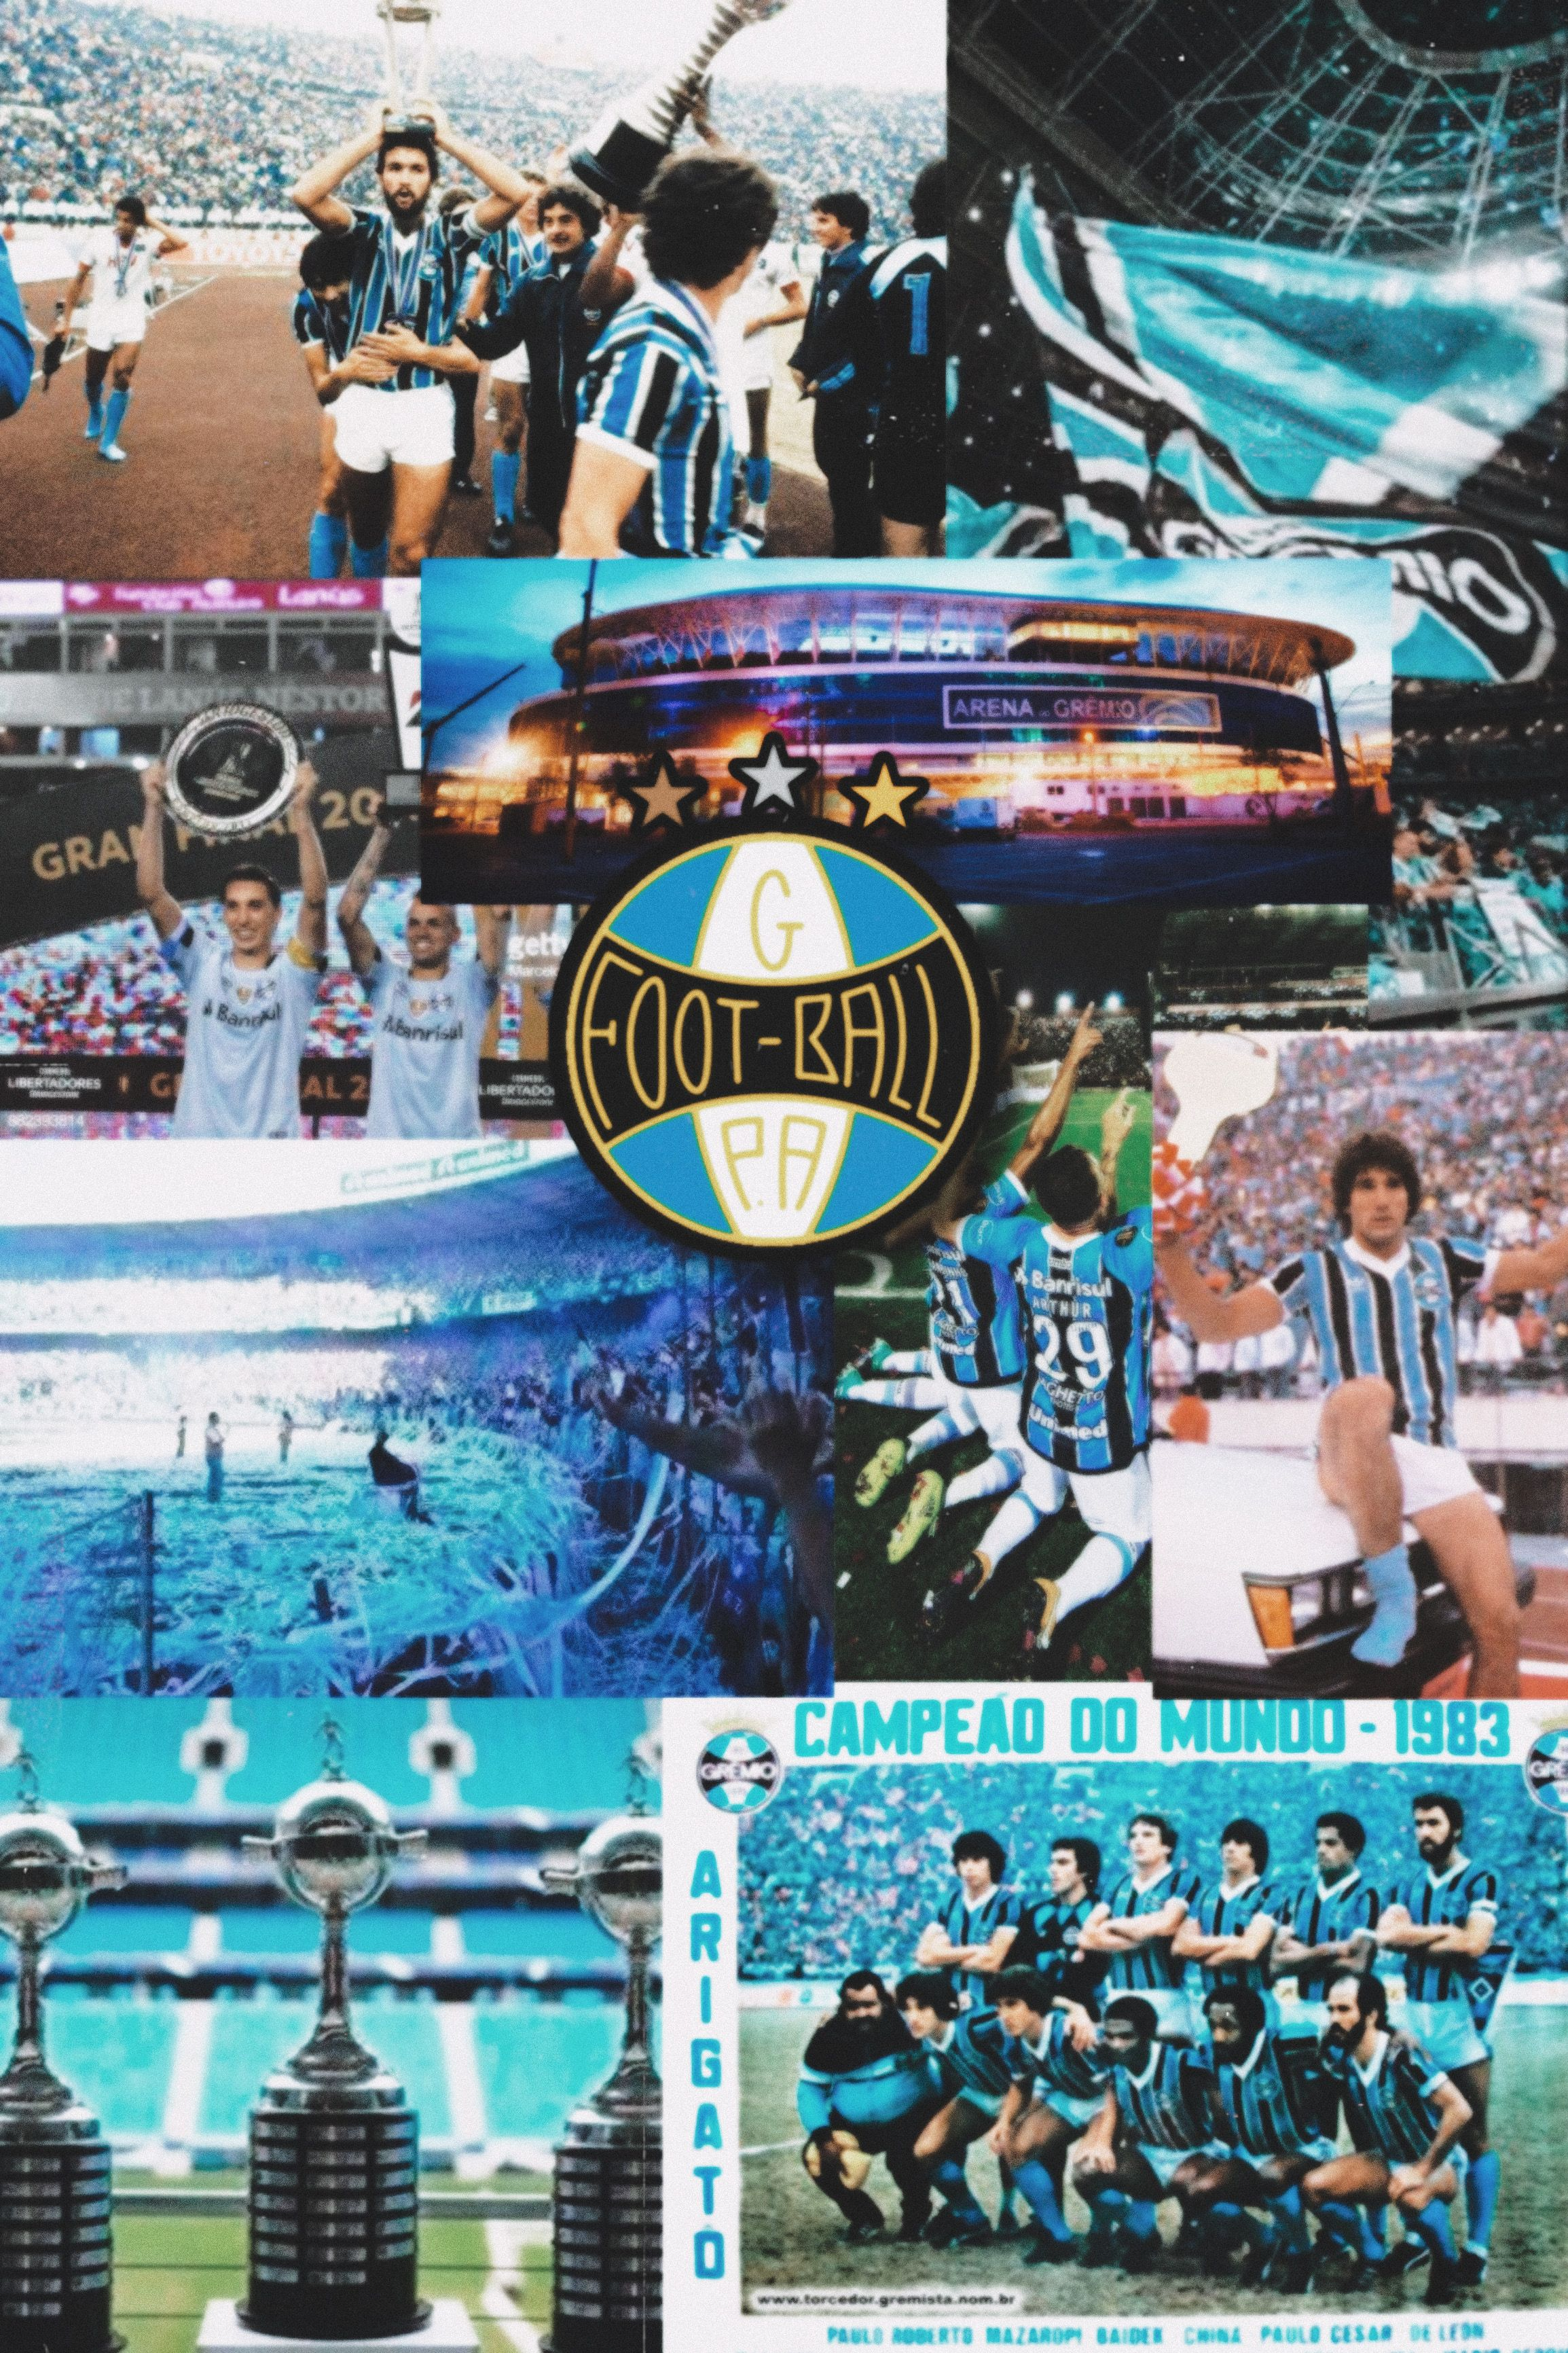 Gremio Fbpa Gremio Wallpaper Gremio Libertadores Gremio